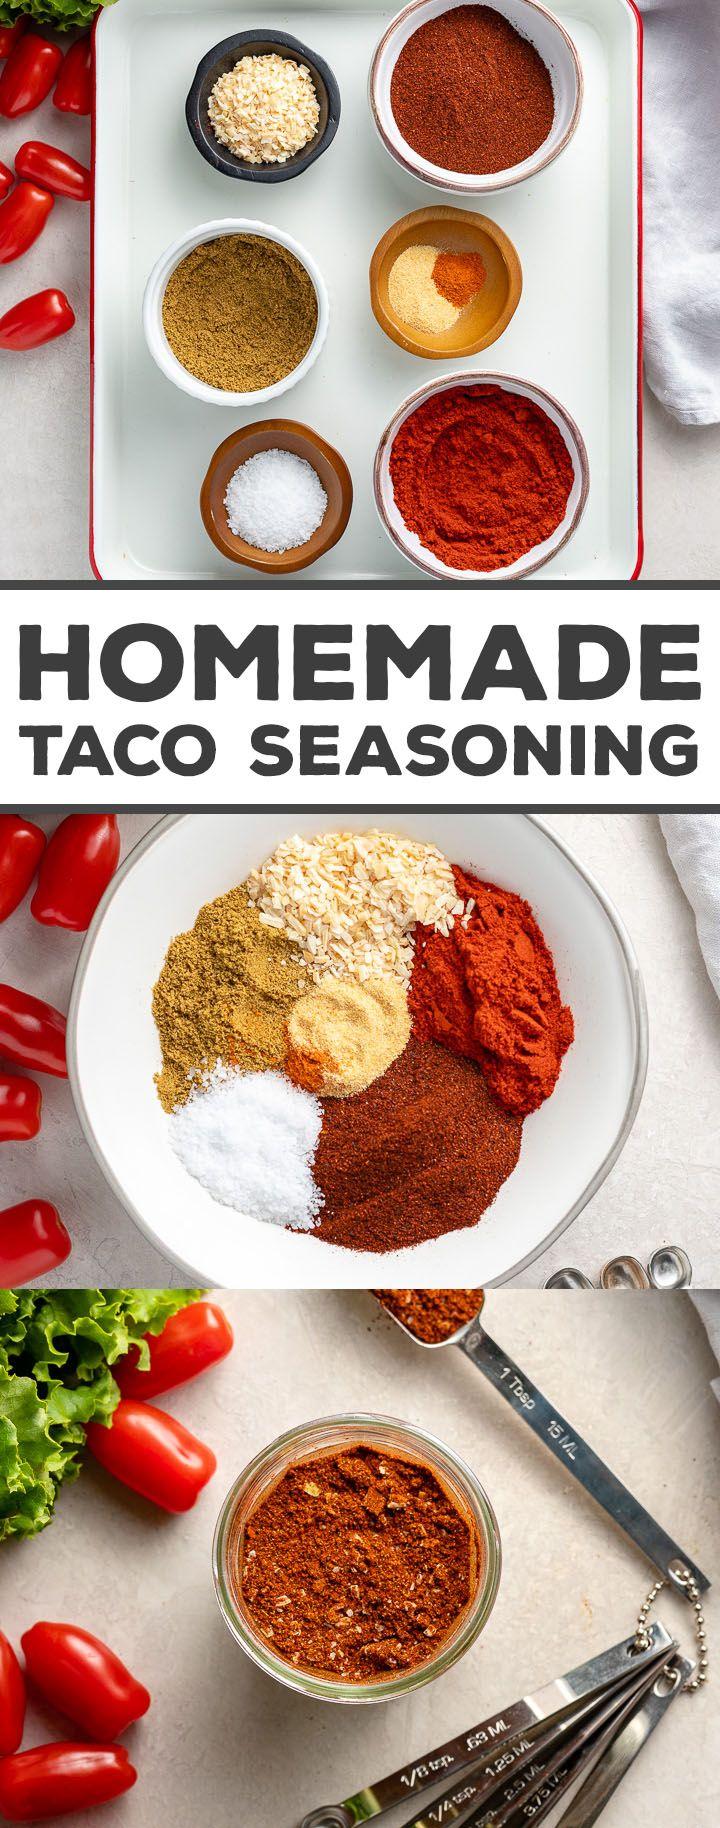 Homemade Taco Seasoning Recipe Homemade Tacos Homemade Taco Seasoning Taco Seasoning